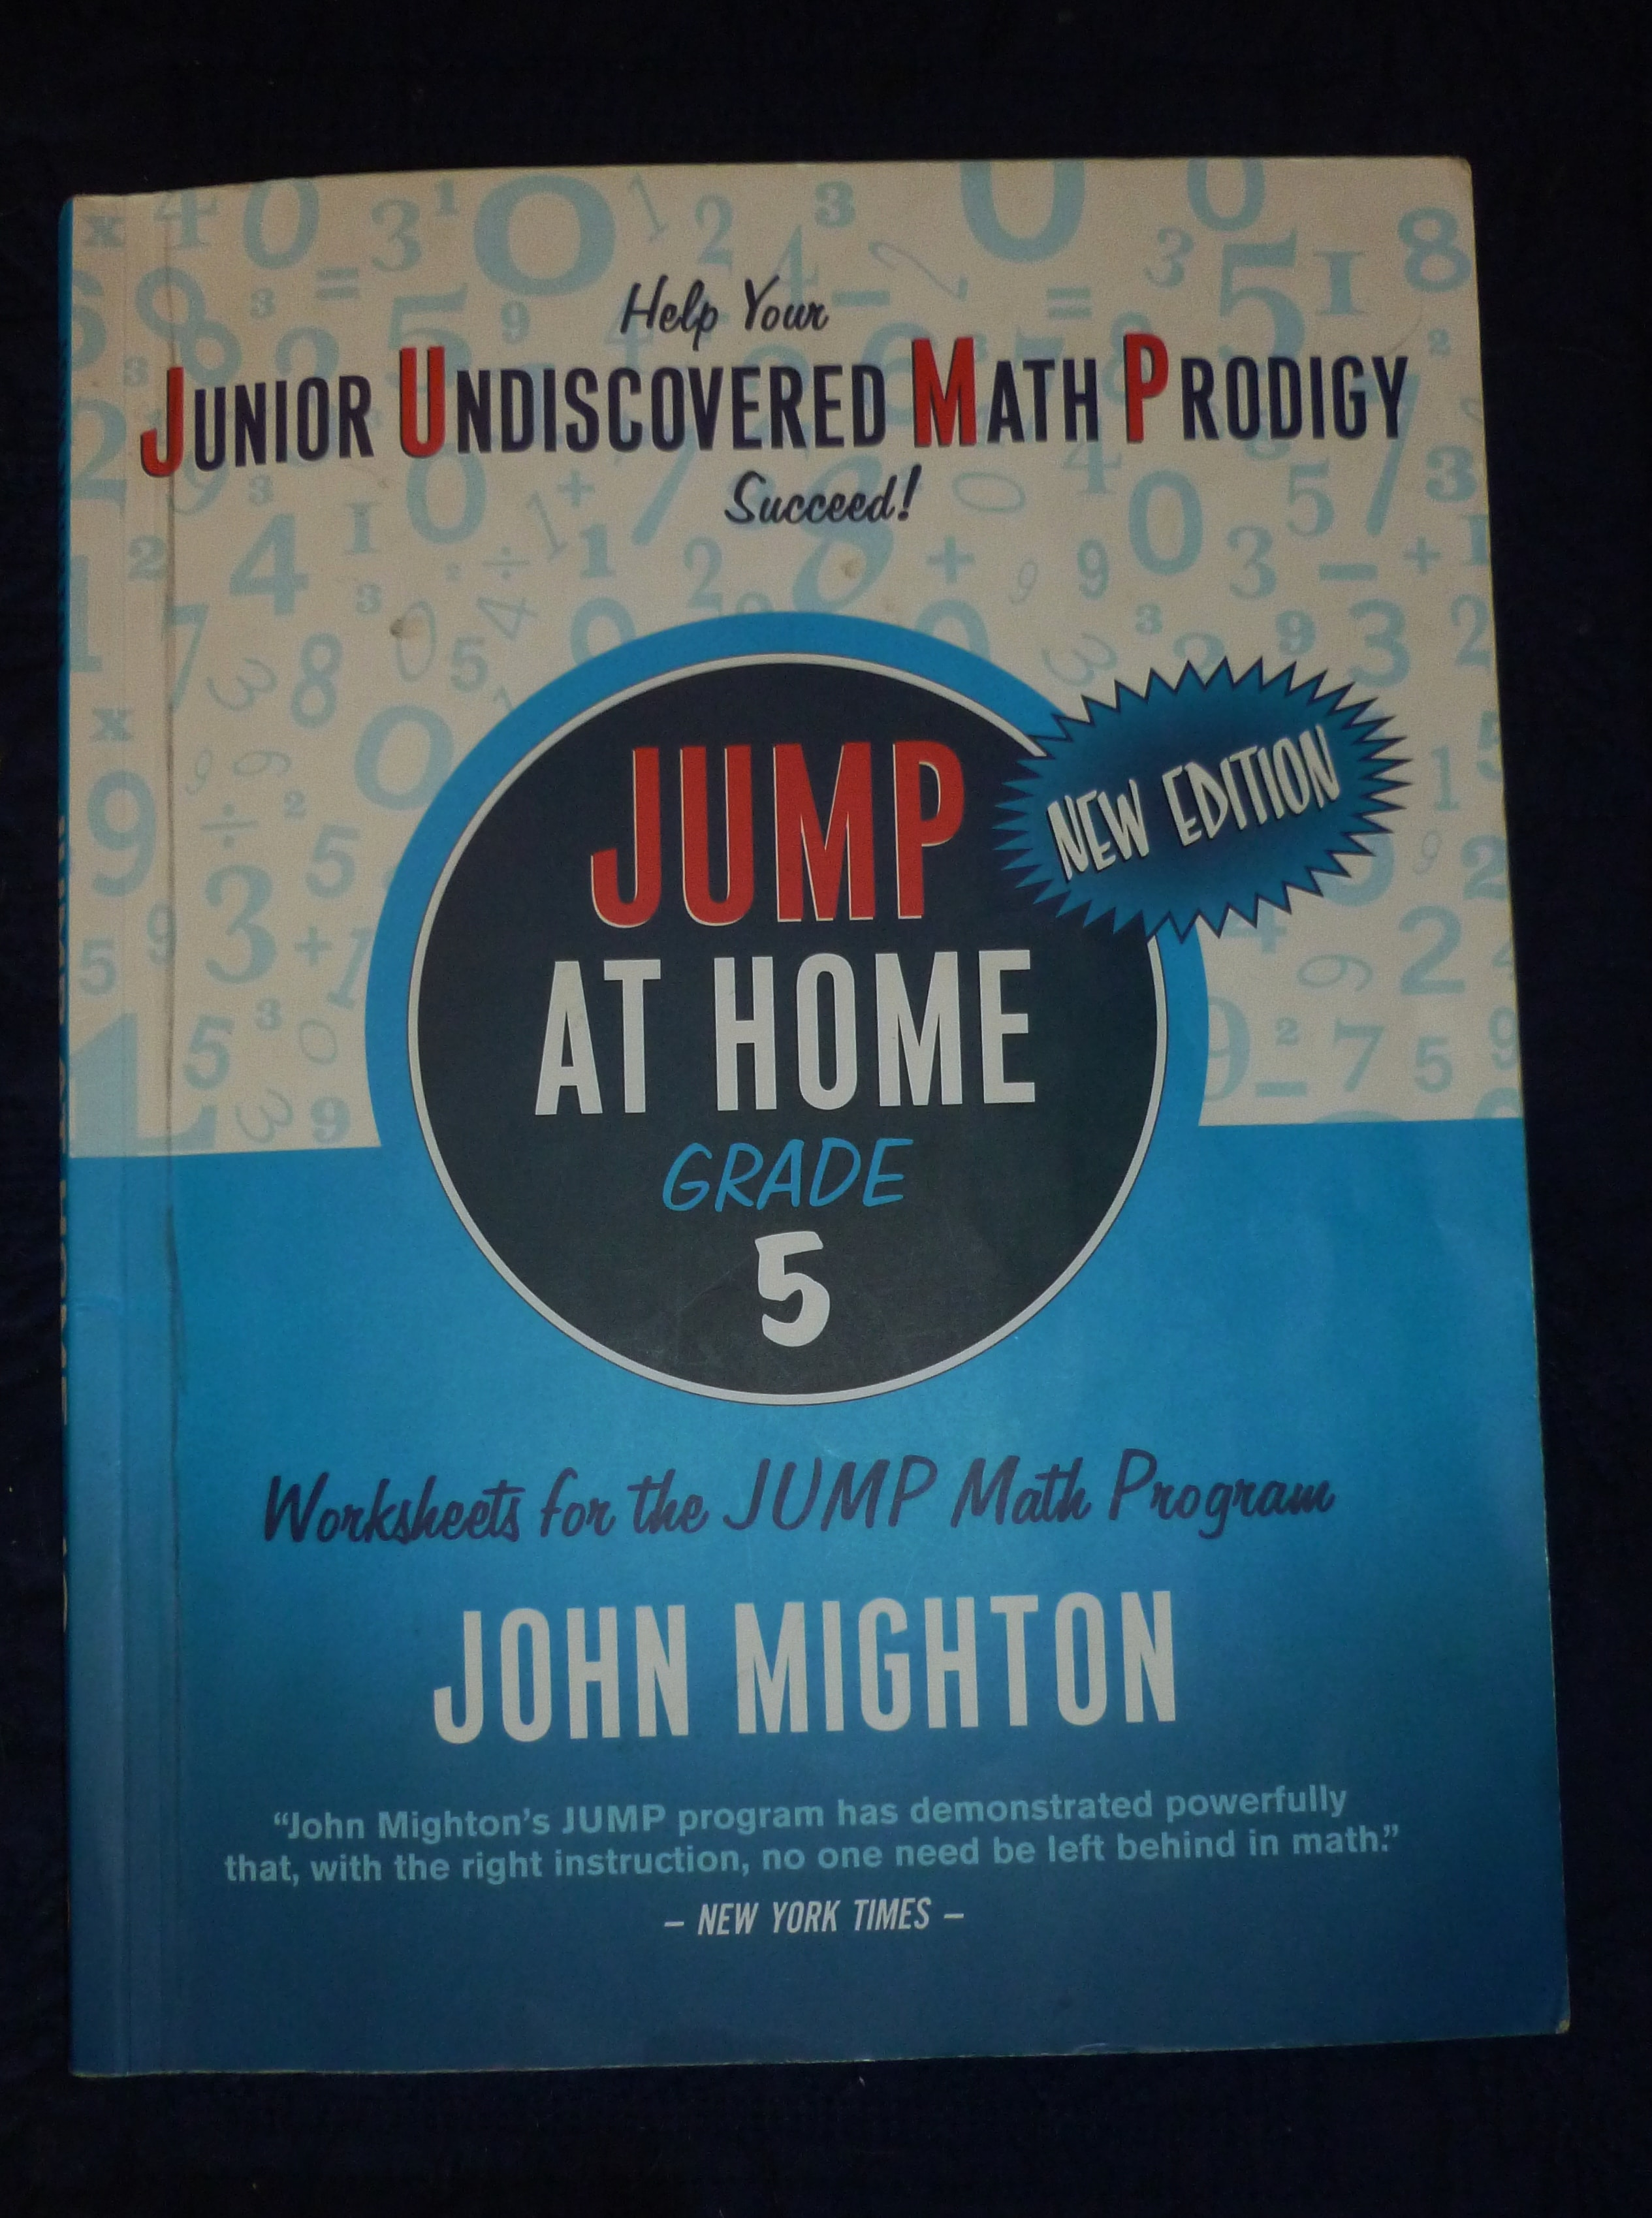 JUMP Math - Junior Undiscovered Math Prodigies - The